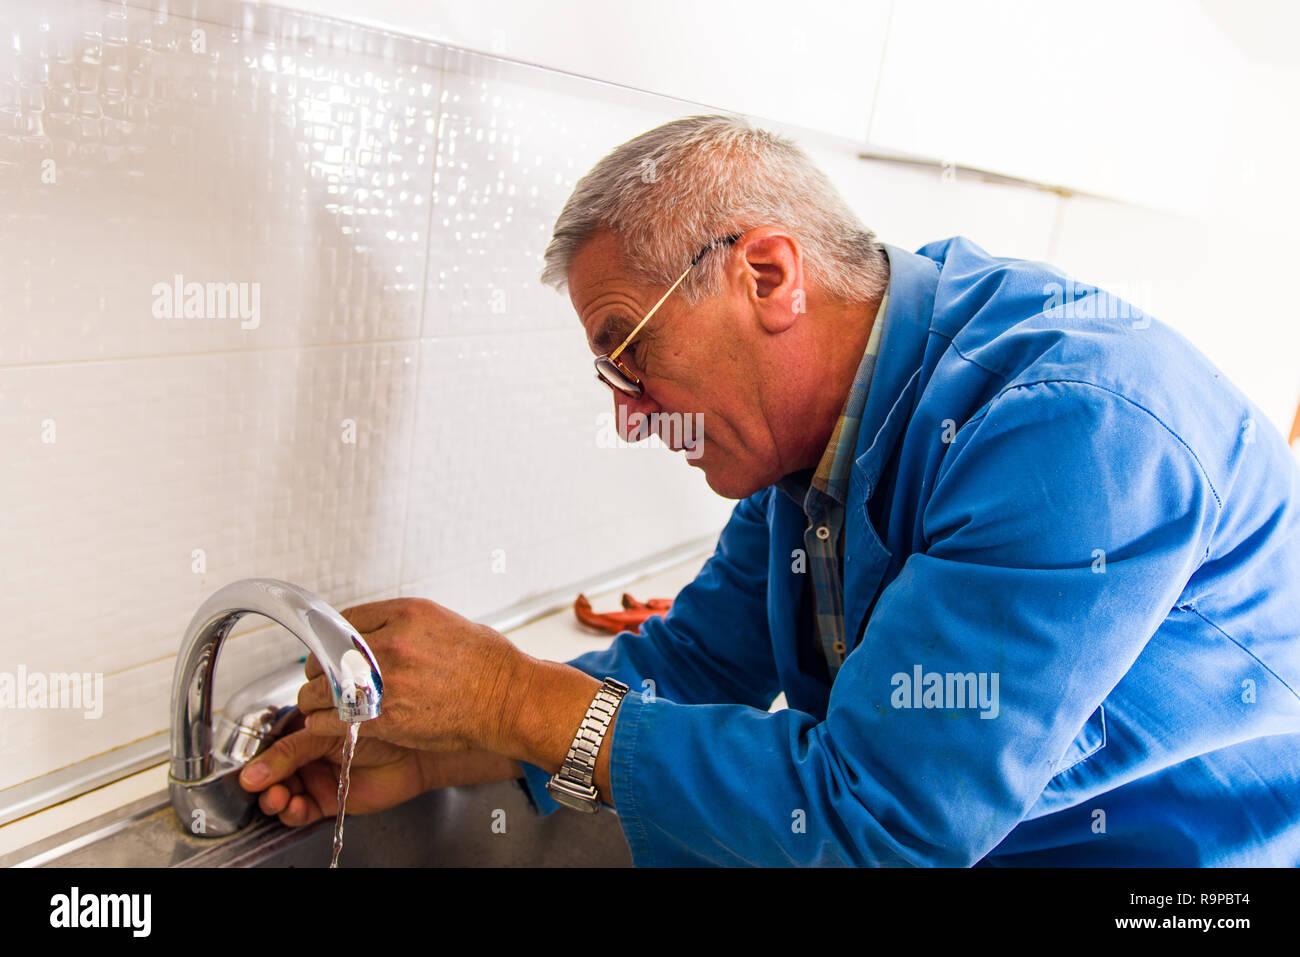 Repairman in blue working suit repair kitchen faucet Stock Photo